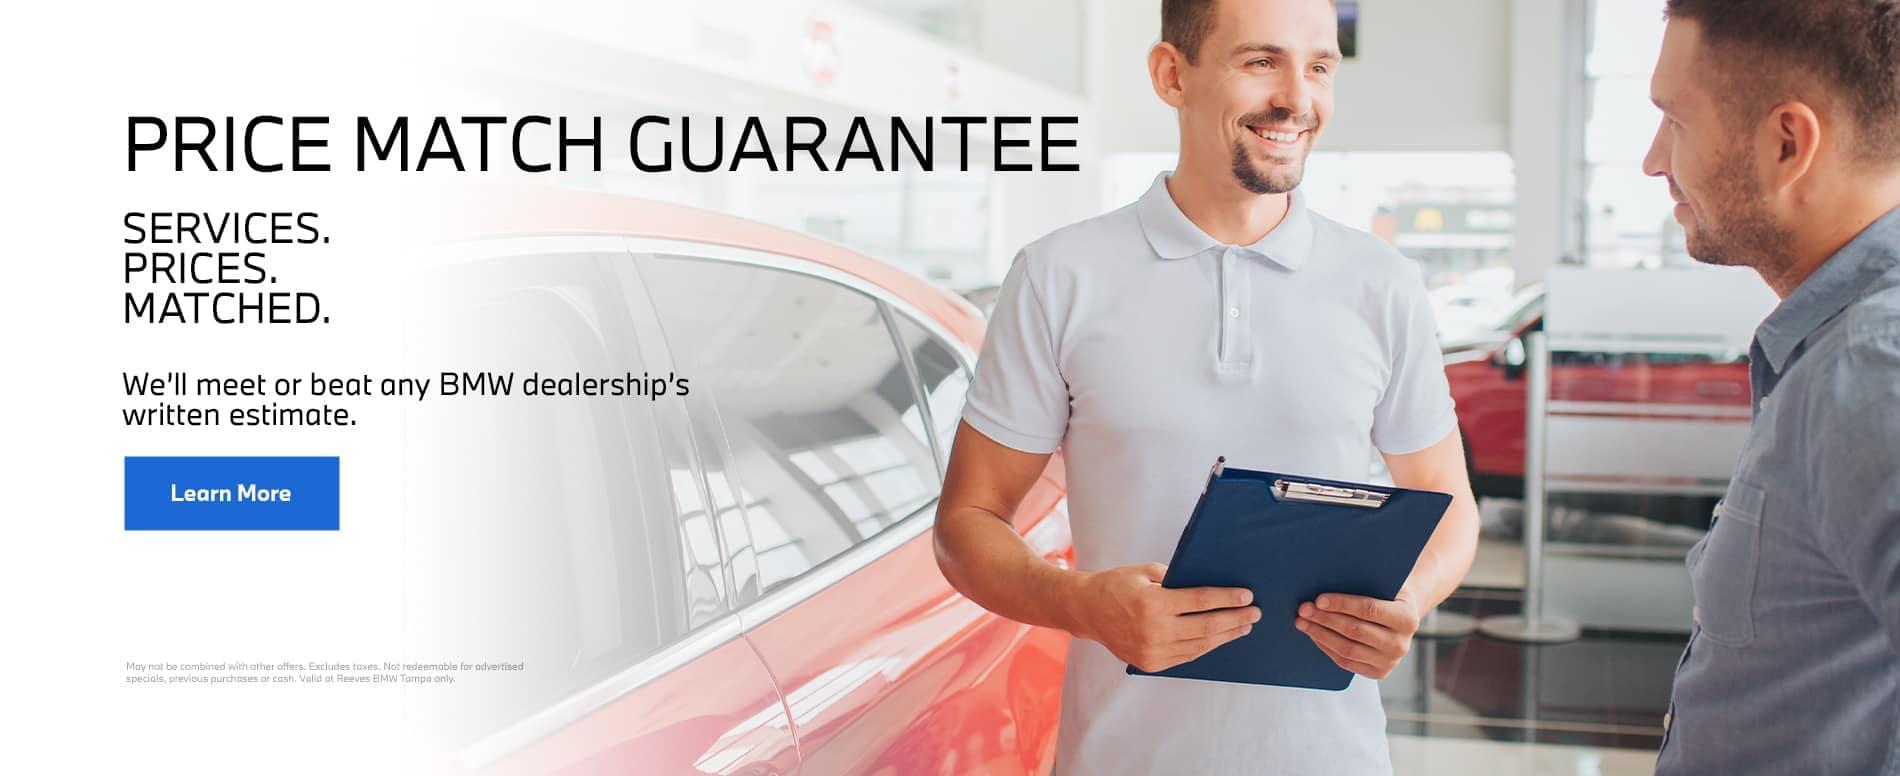 Service Price Match Guarantee